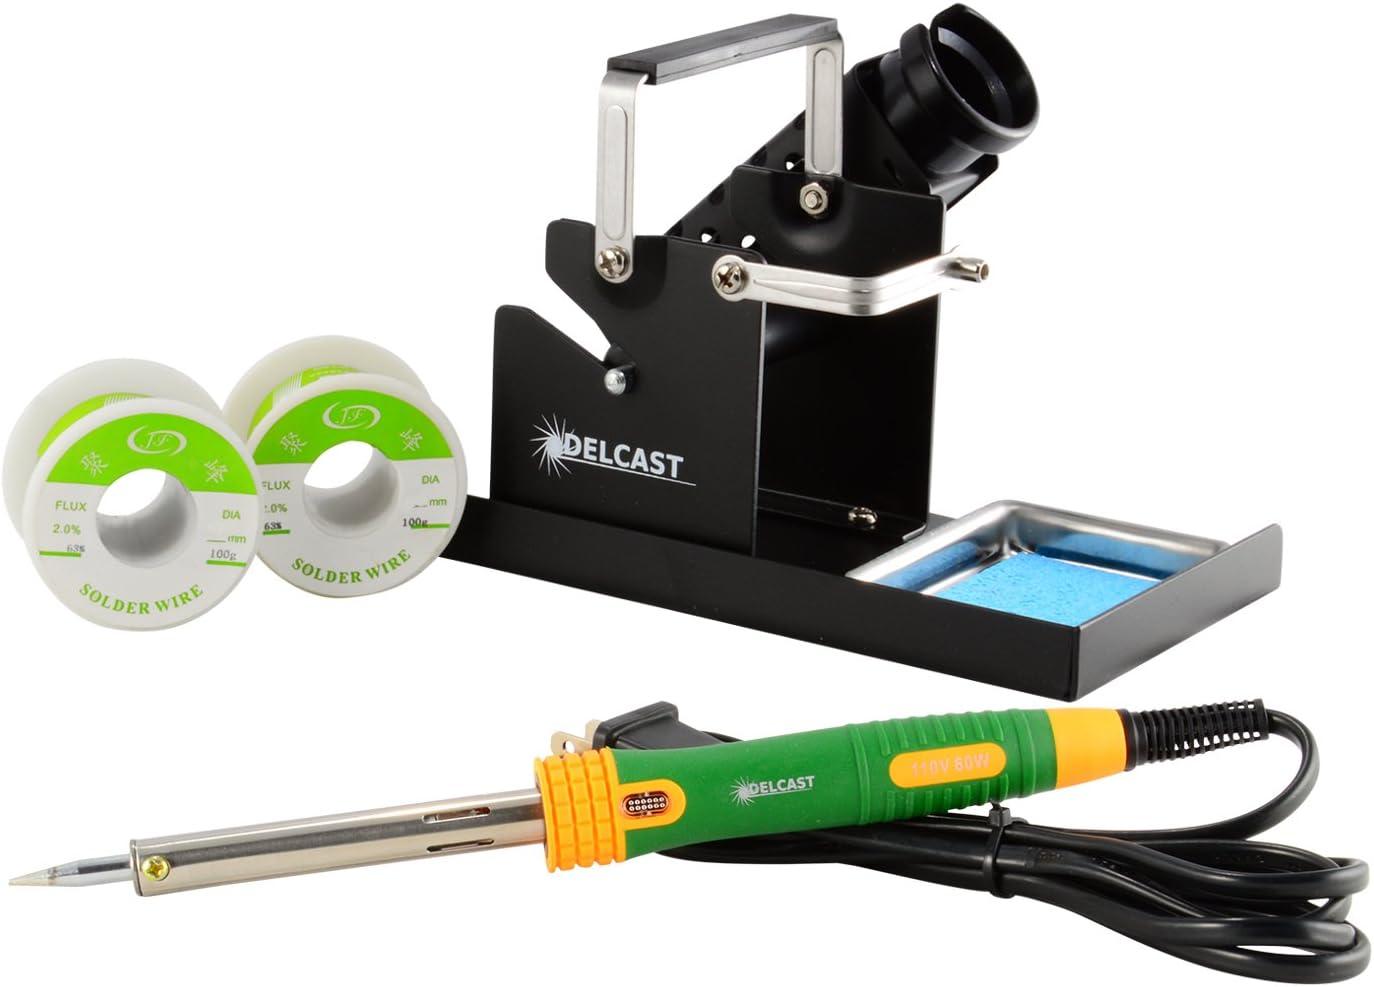 Delcast Soldering Pro Tool Low price Kit 60W Solderi Soldering Iron with